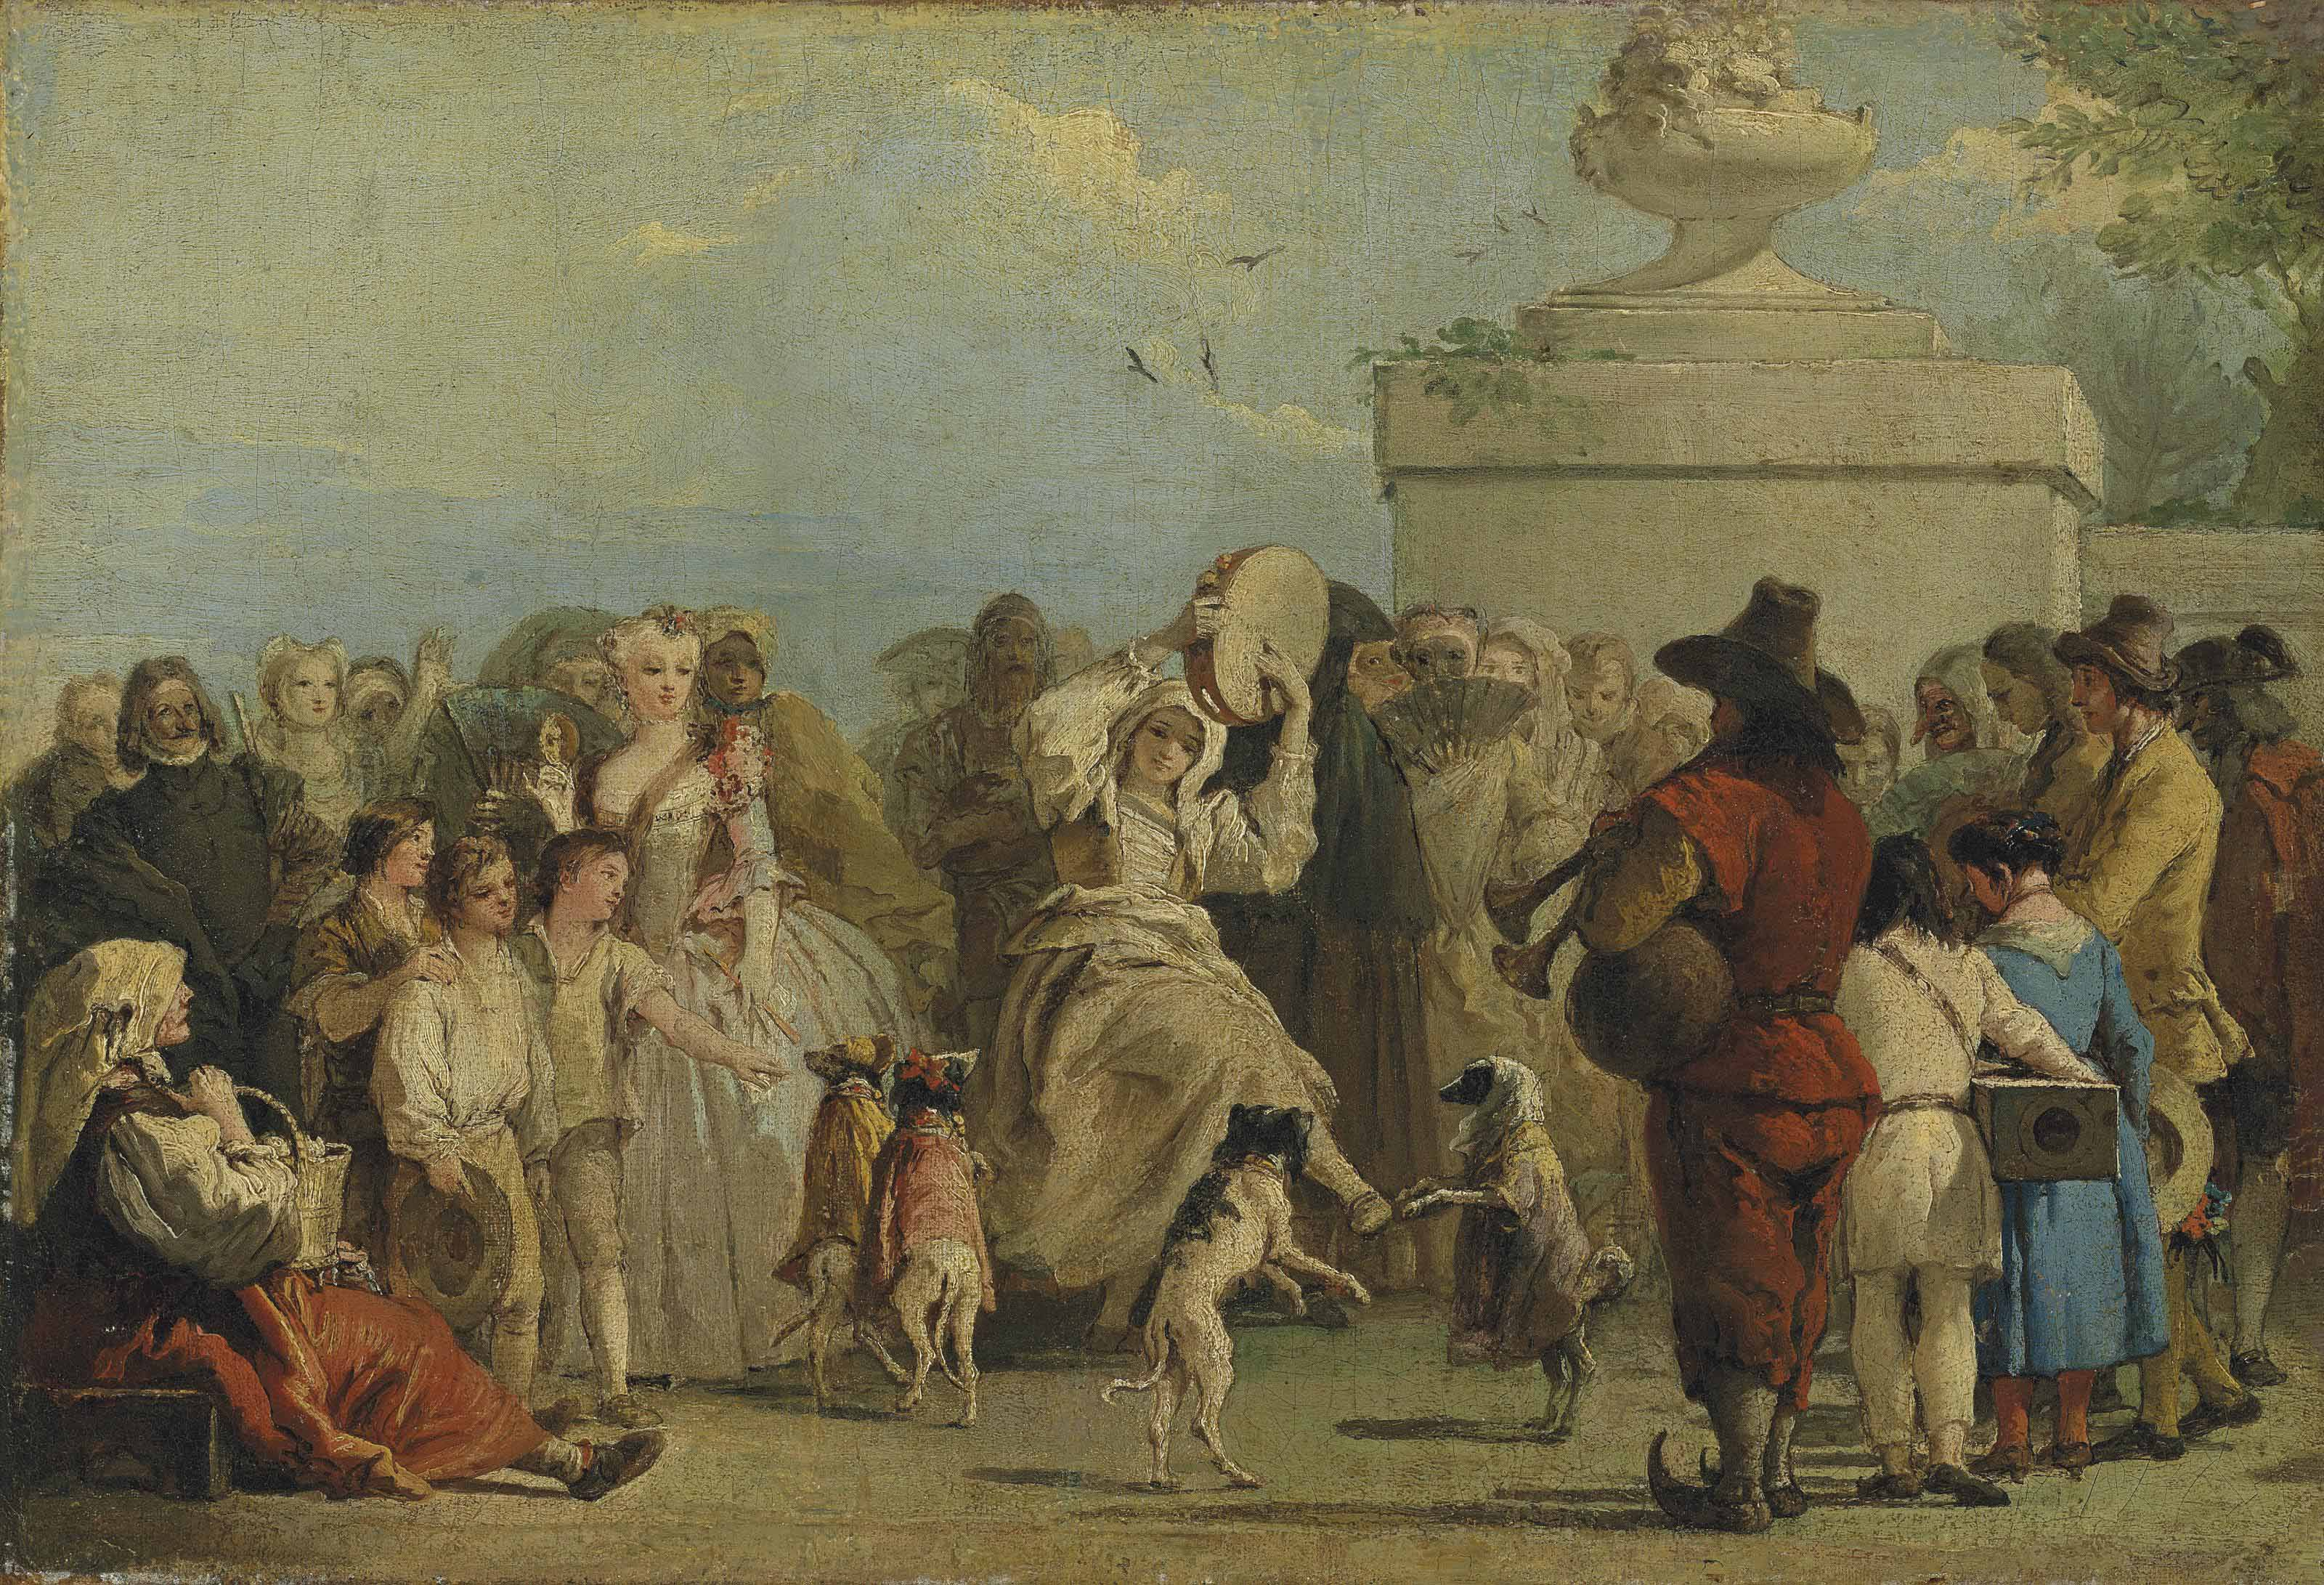 Giandomenico Tiepolo (Venice 1